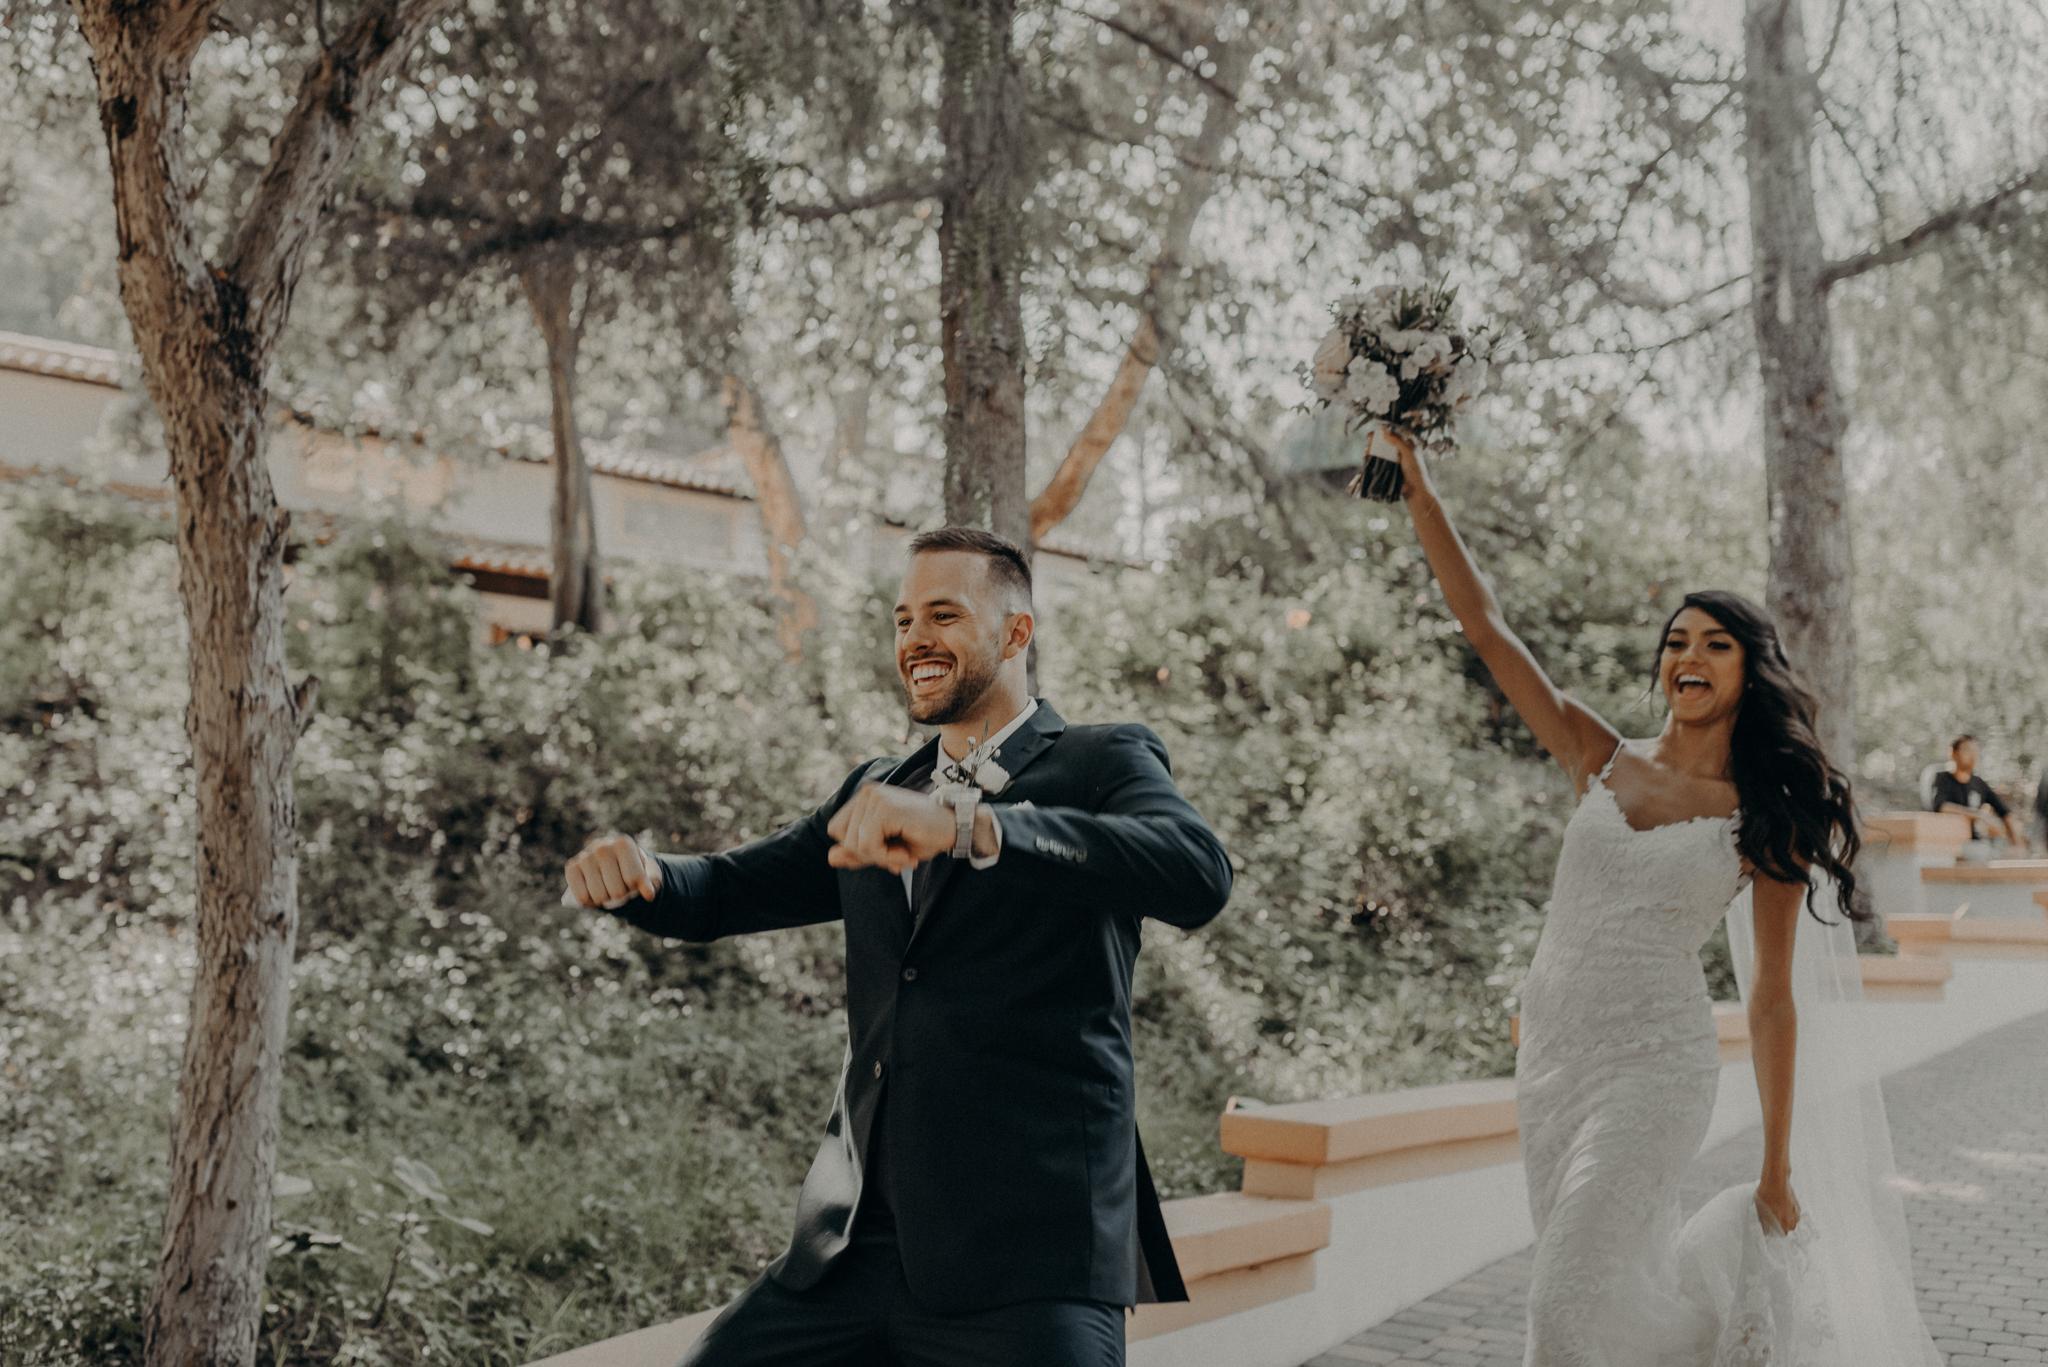 Isaiah + Taylor Photography - Rancho Las Lomas Wedding, Los Angeles Wedding Photographer-070.jpg